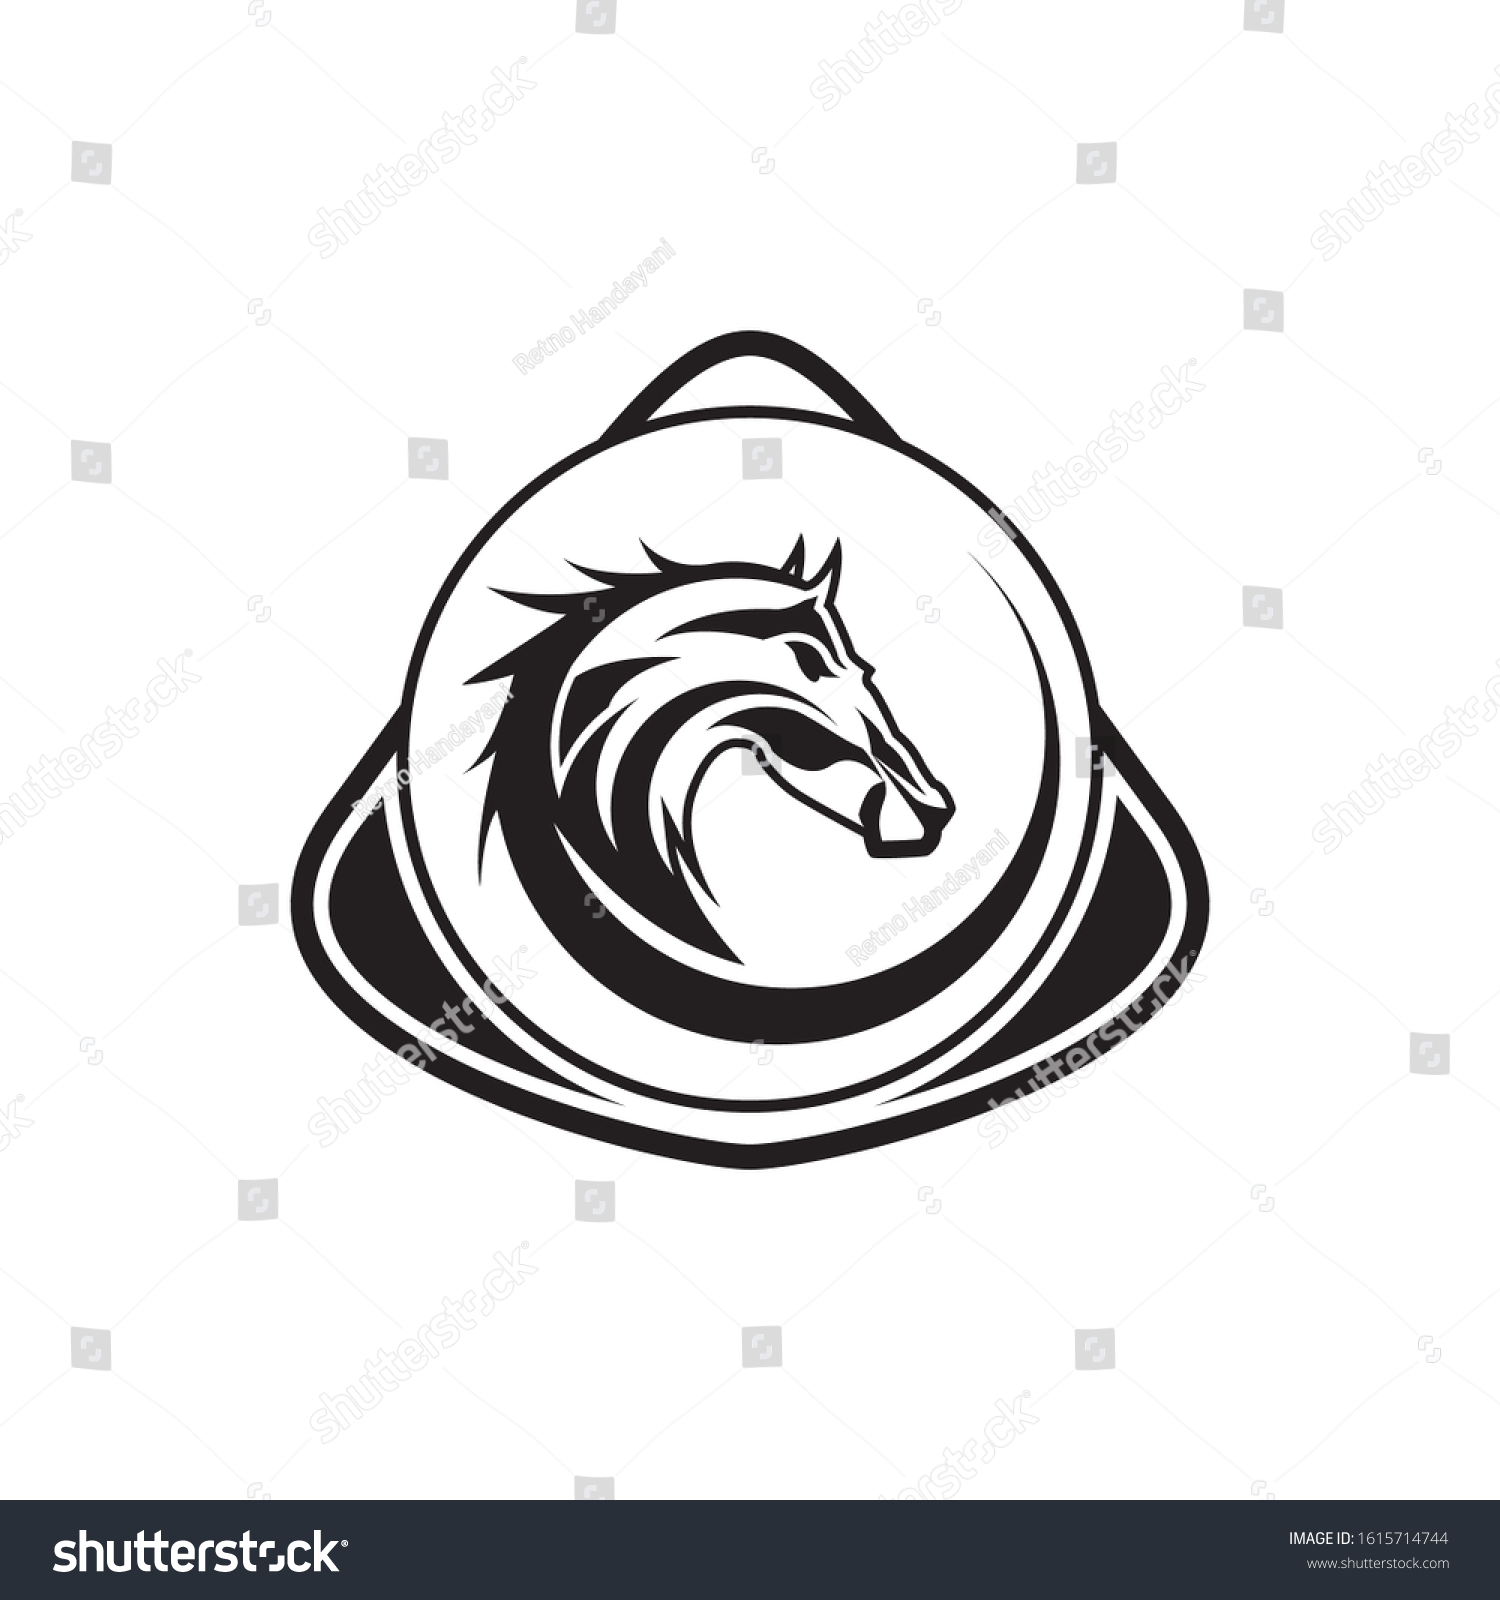 Horse Tattoo Designs Men Stock Vector Royalty Free 1615714744